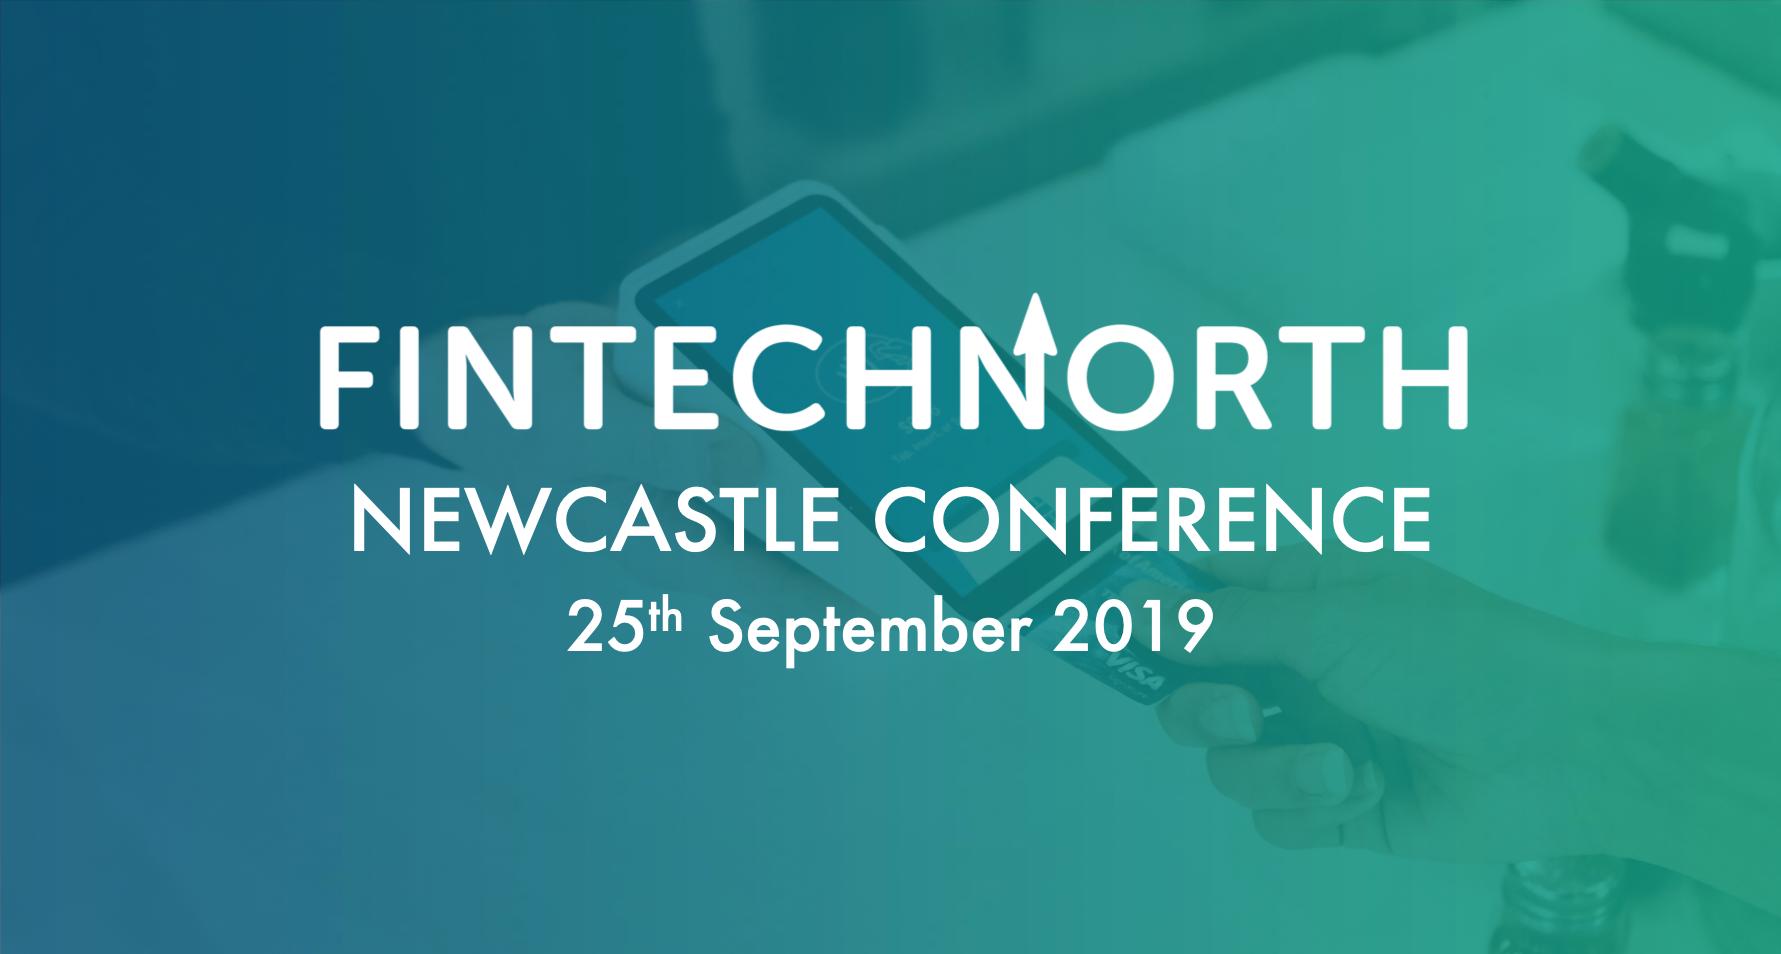 FinTech North Newcastle Conference